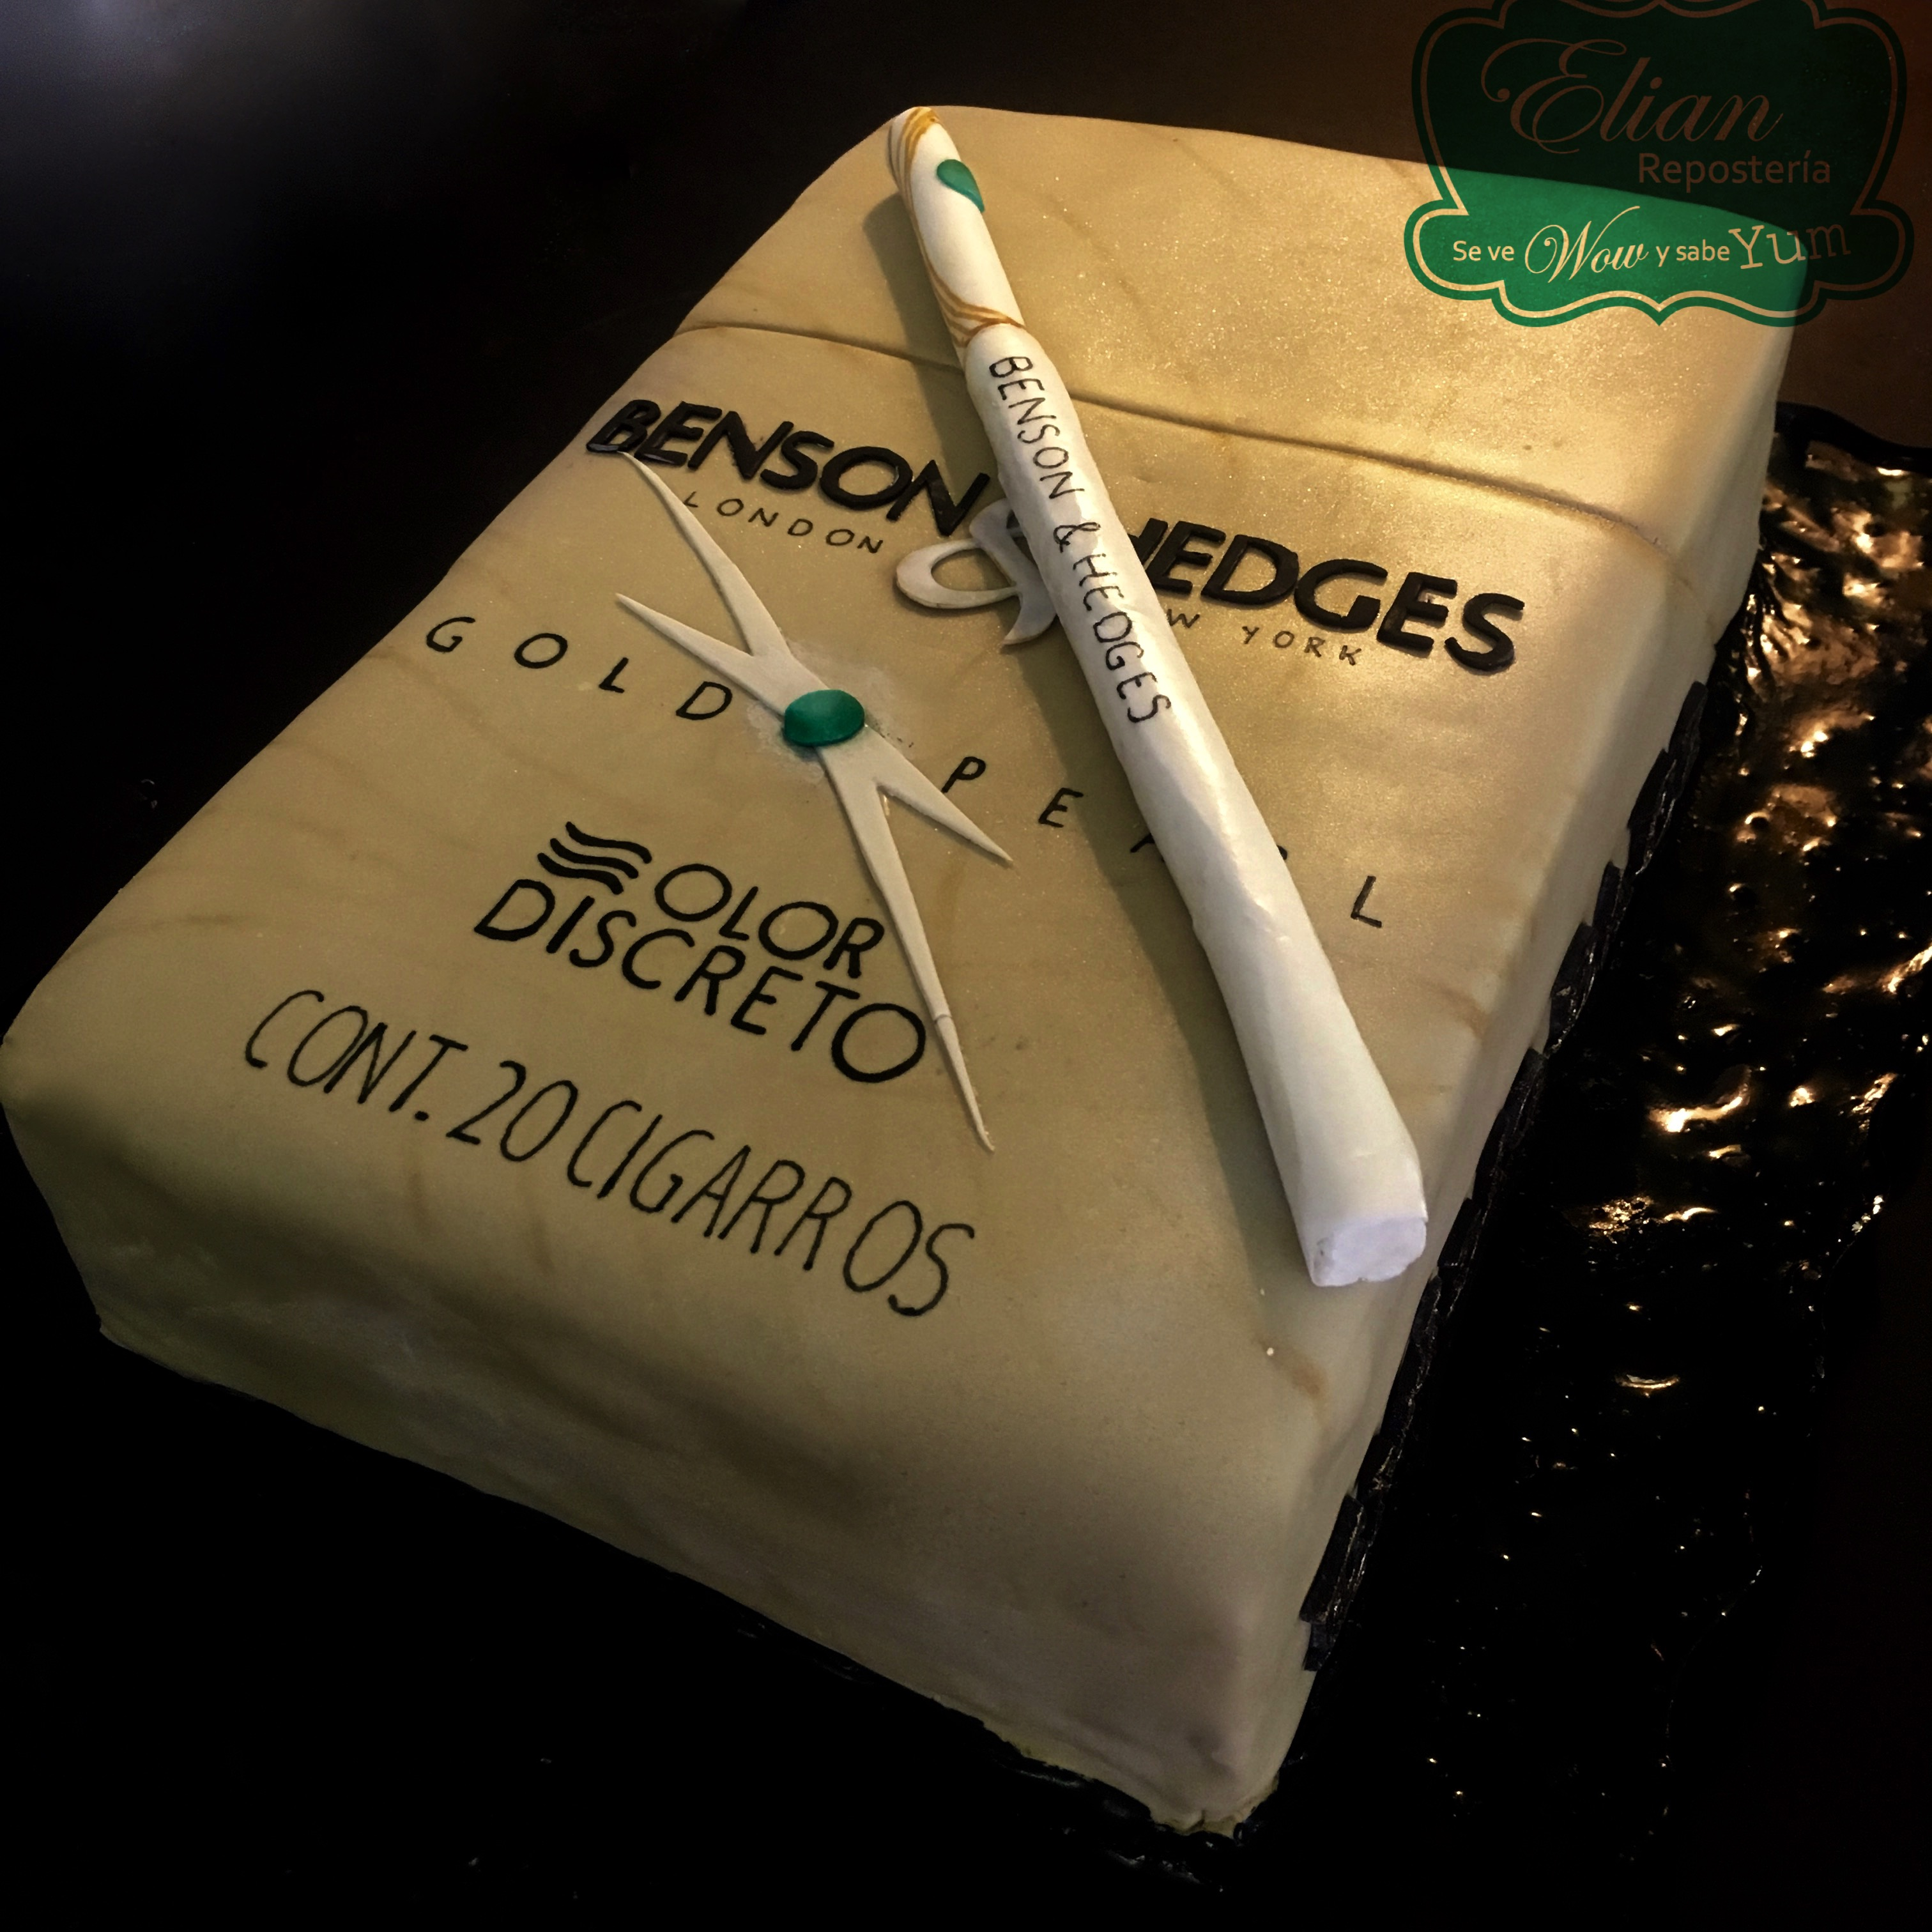 Cajetilla de cigarros pastel